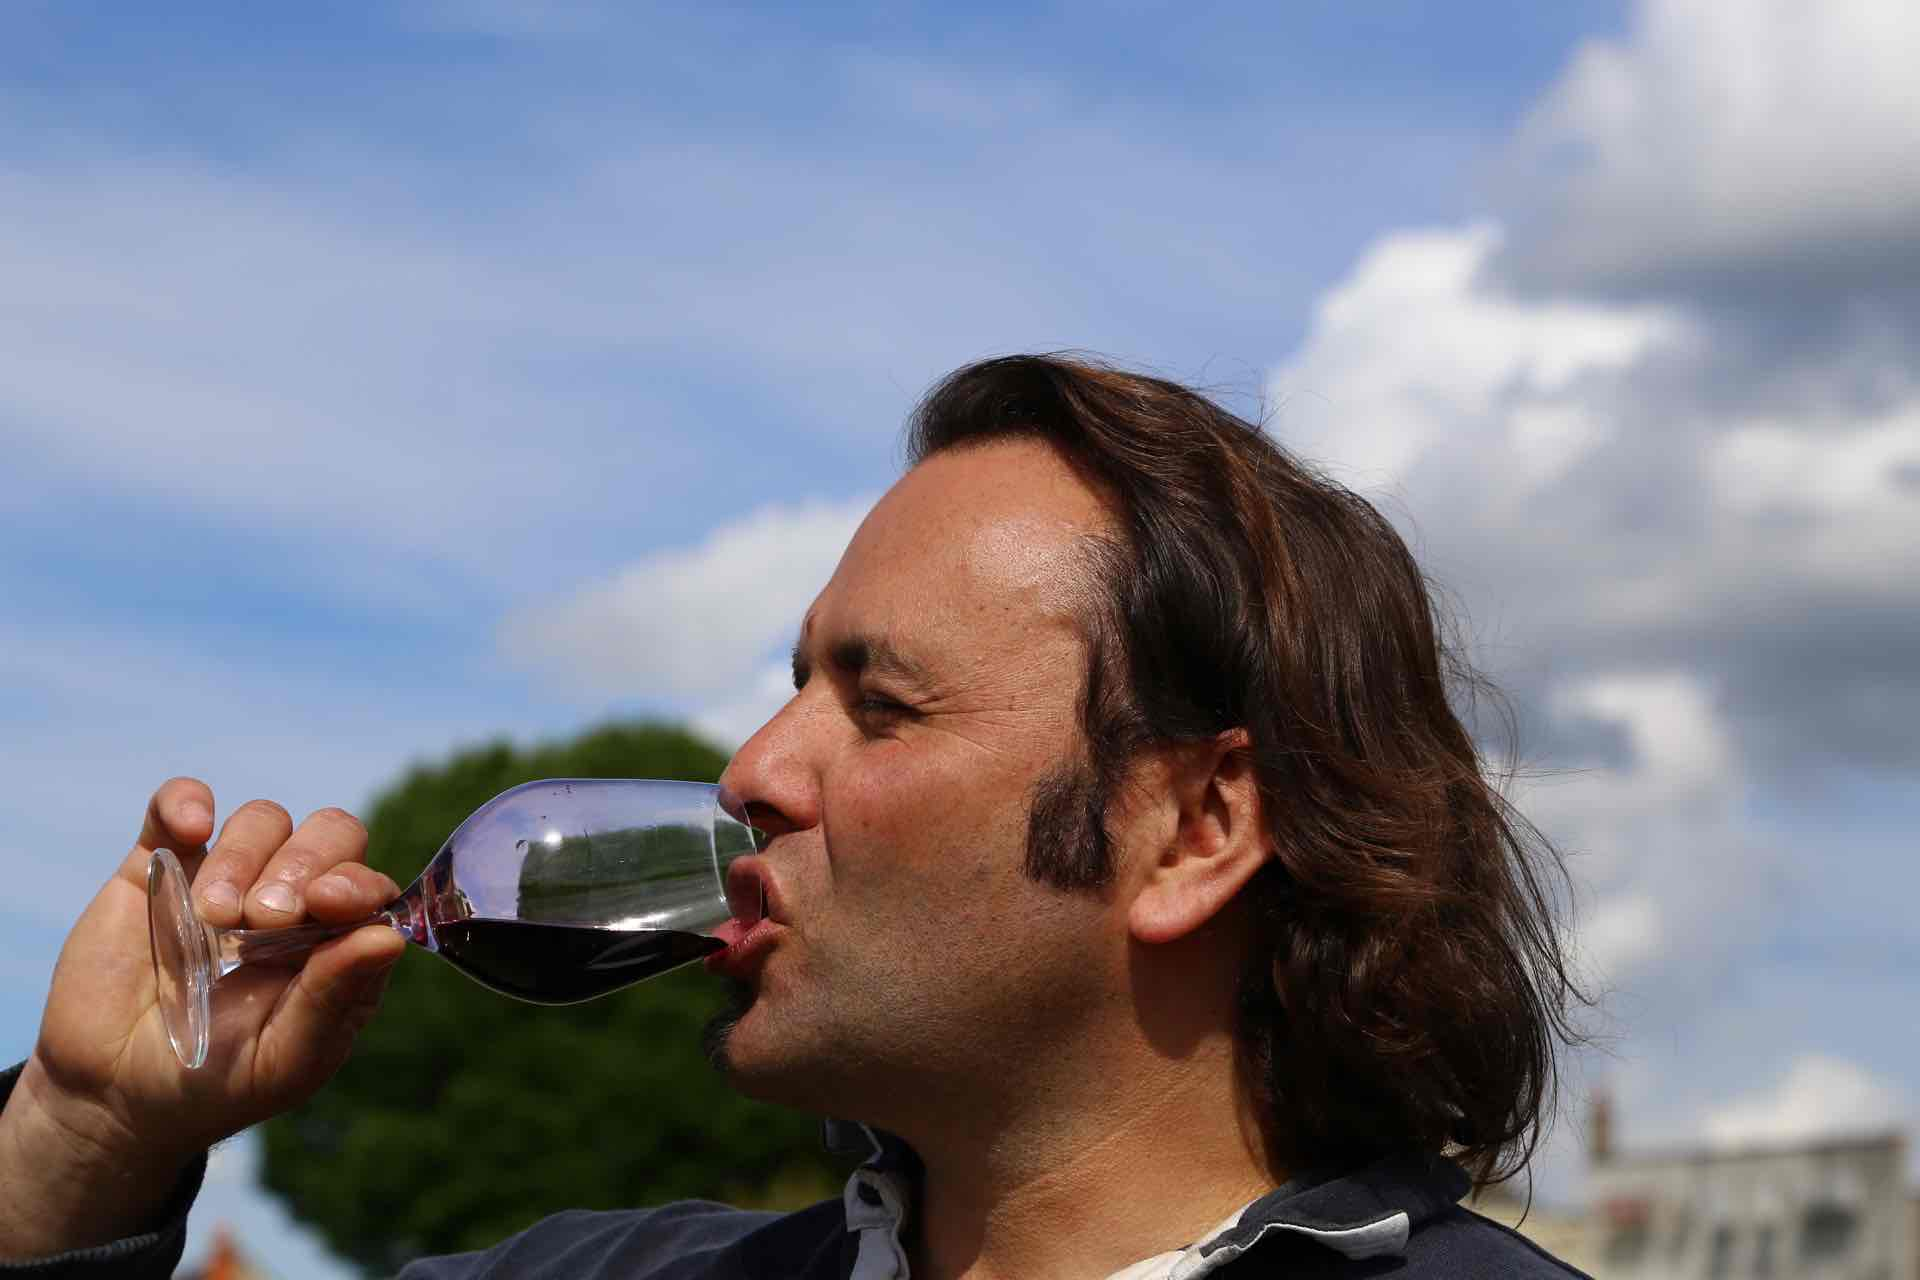 Domaine Sébastien David - アペロ ワインバー / apéro WINEBAR - vins et petits plats français - Minami Aoyama Tokyo